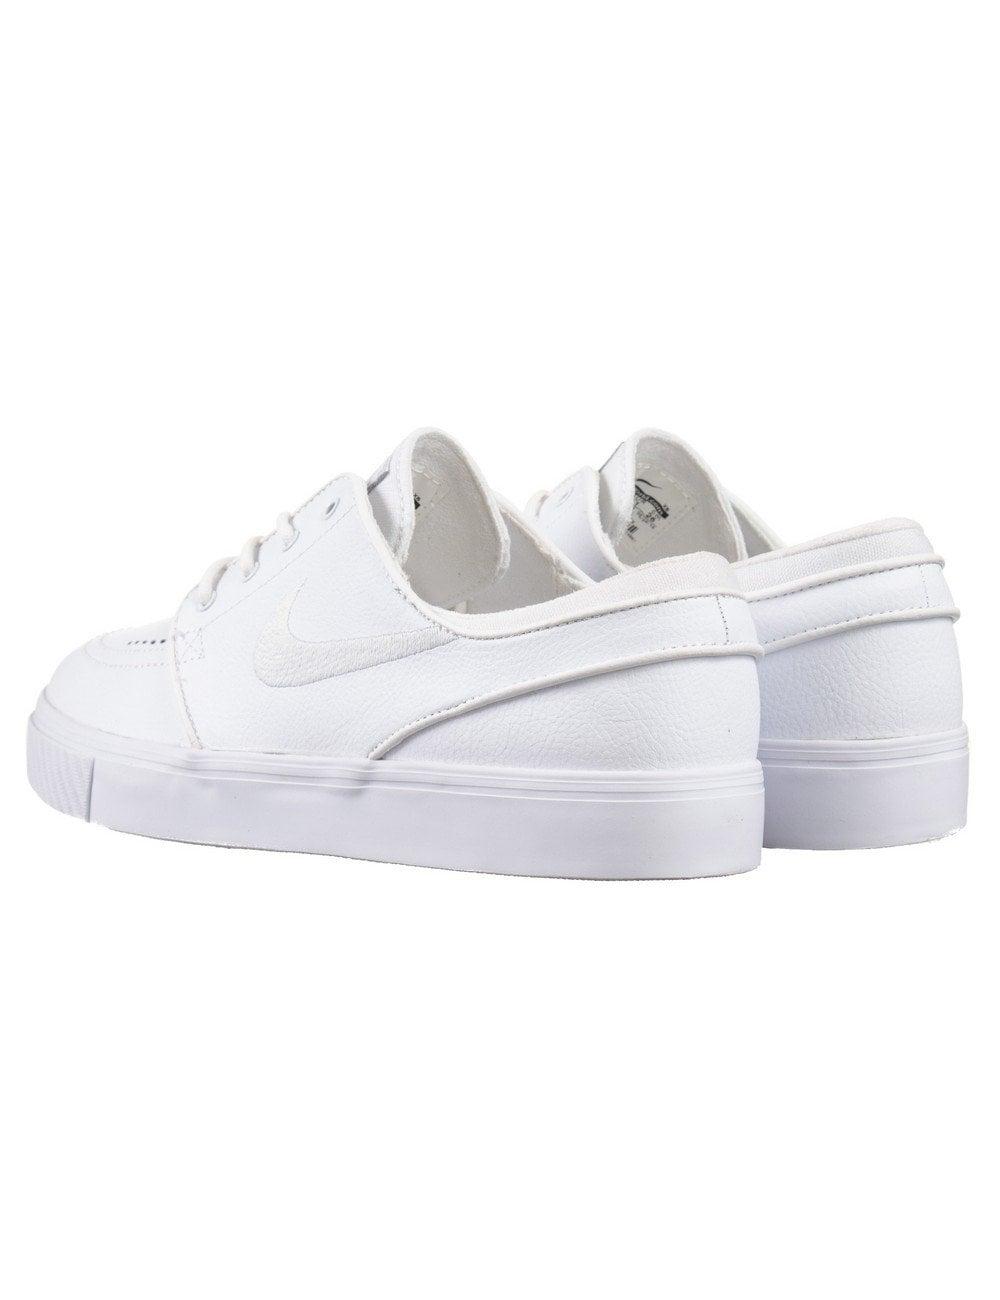 b733845280 Nike SB Stefan Janoski Leather Shoes - White/White - Footwear from ...